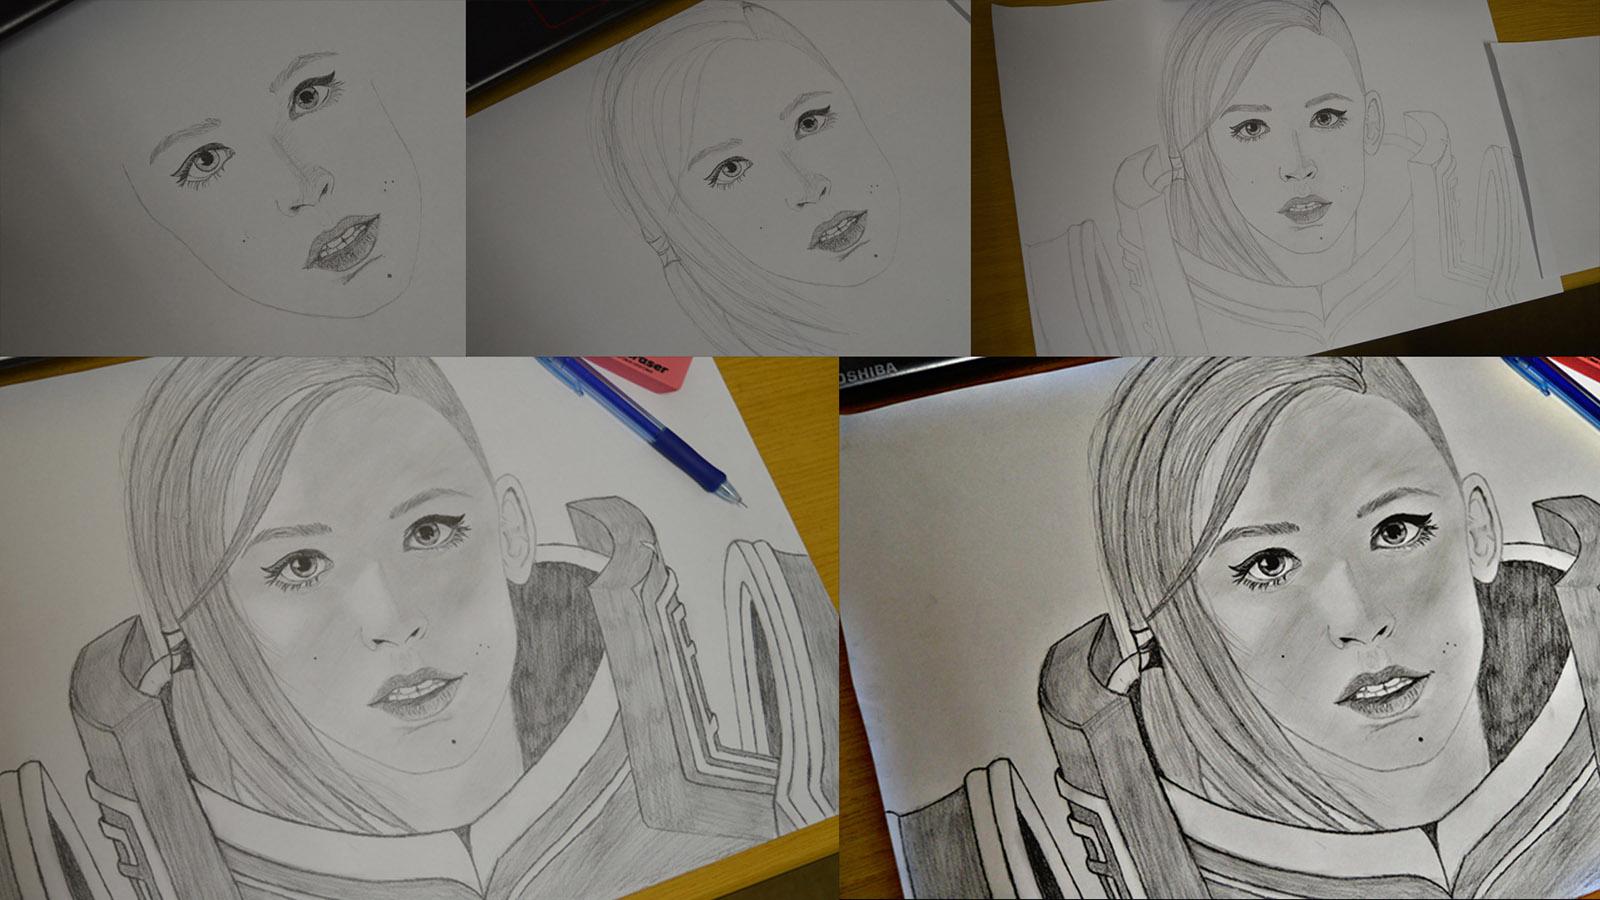 Drawing fan art of Johanna from Hots - combined